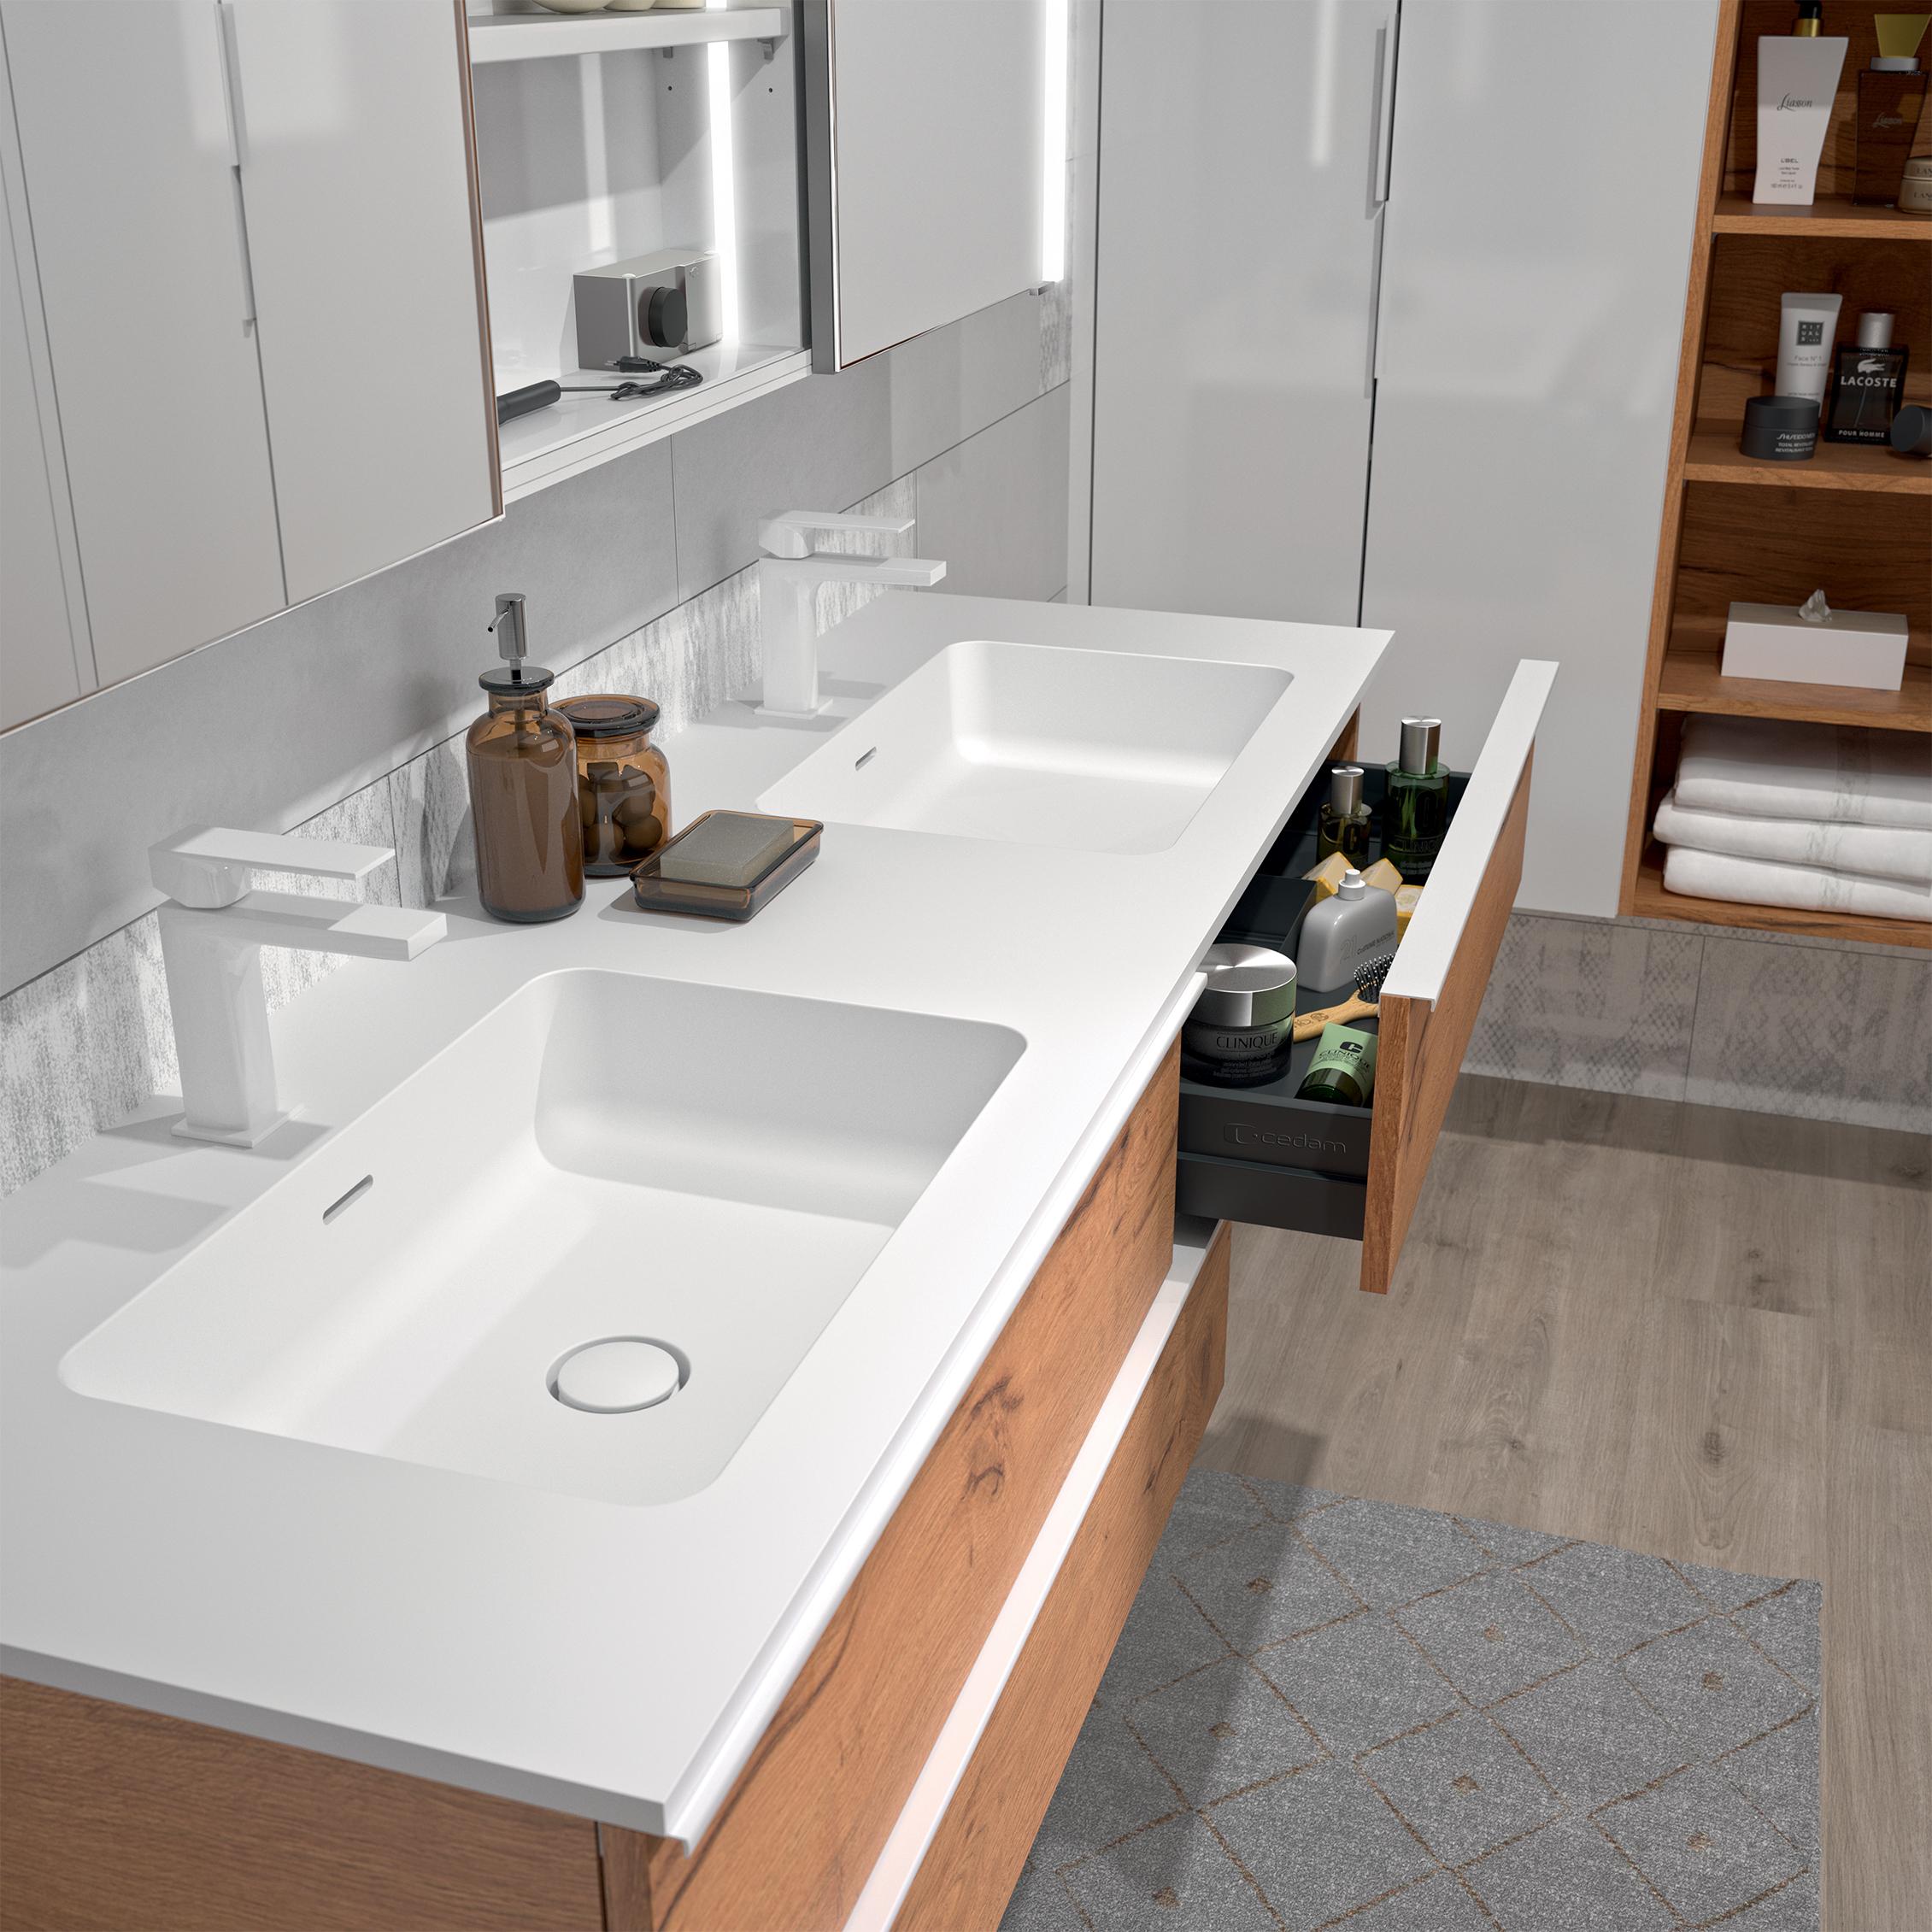 Espace Entre 2 Vasques extenso | meubles de salle de bains, baignoires, fabricant